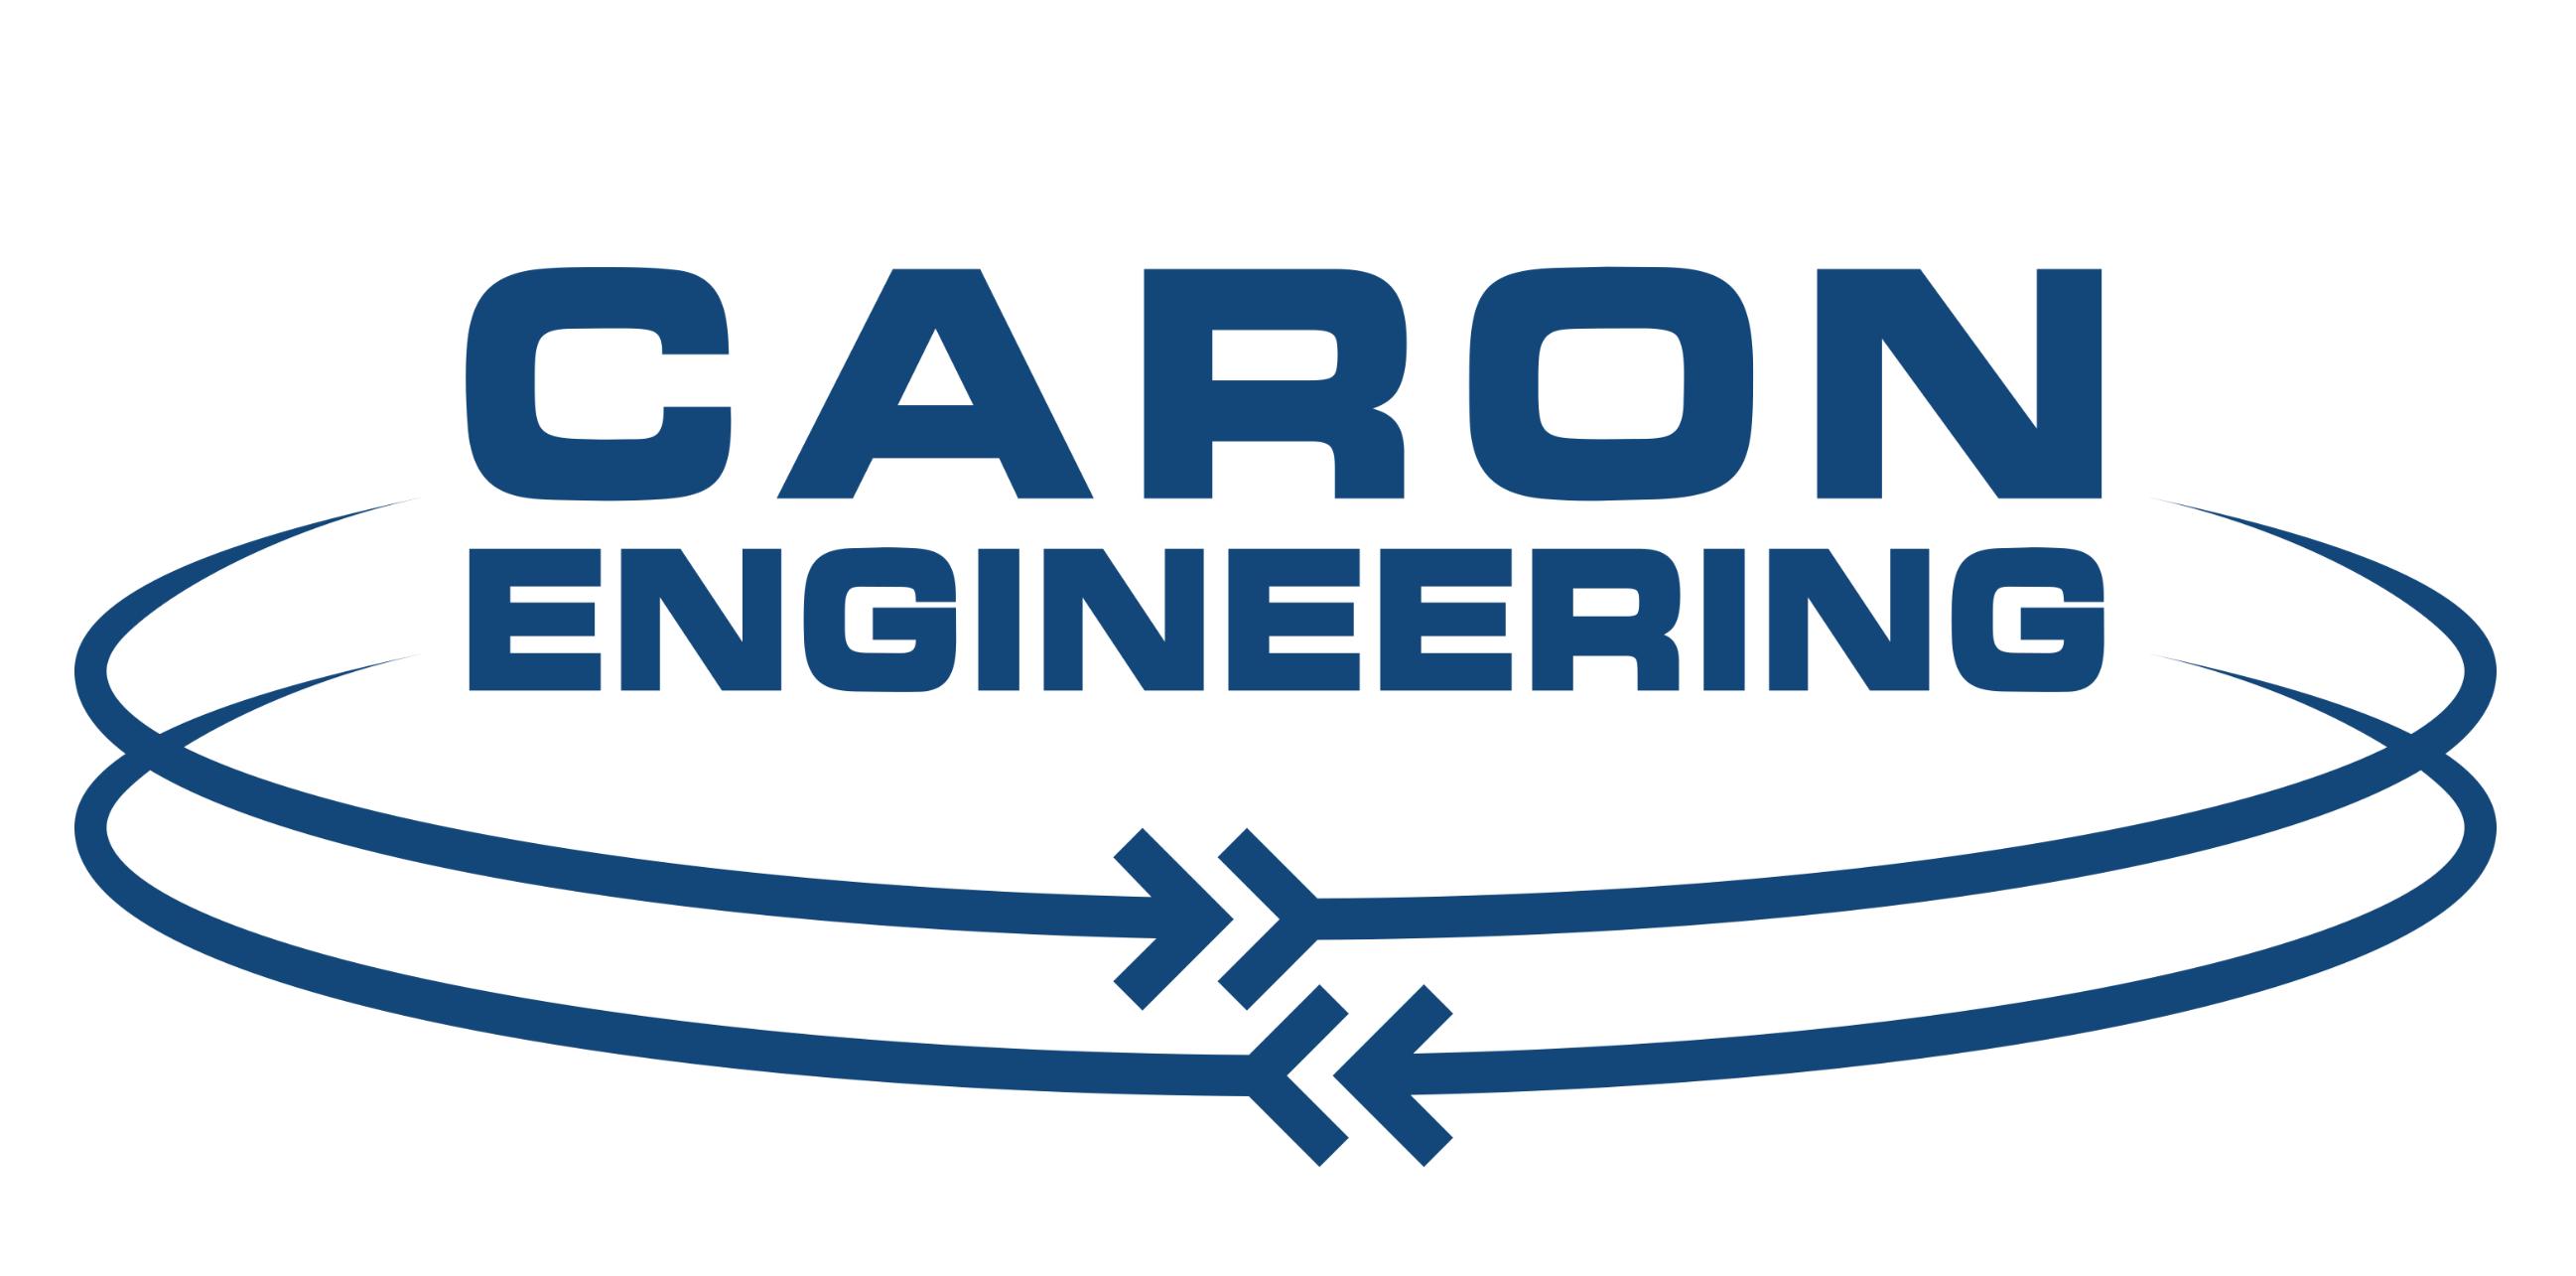 Caron Engineering